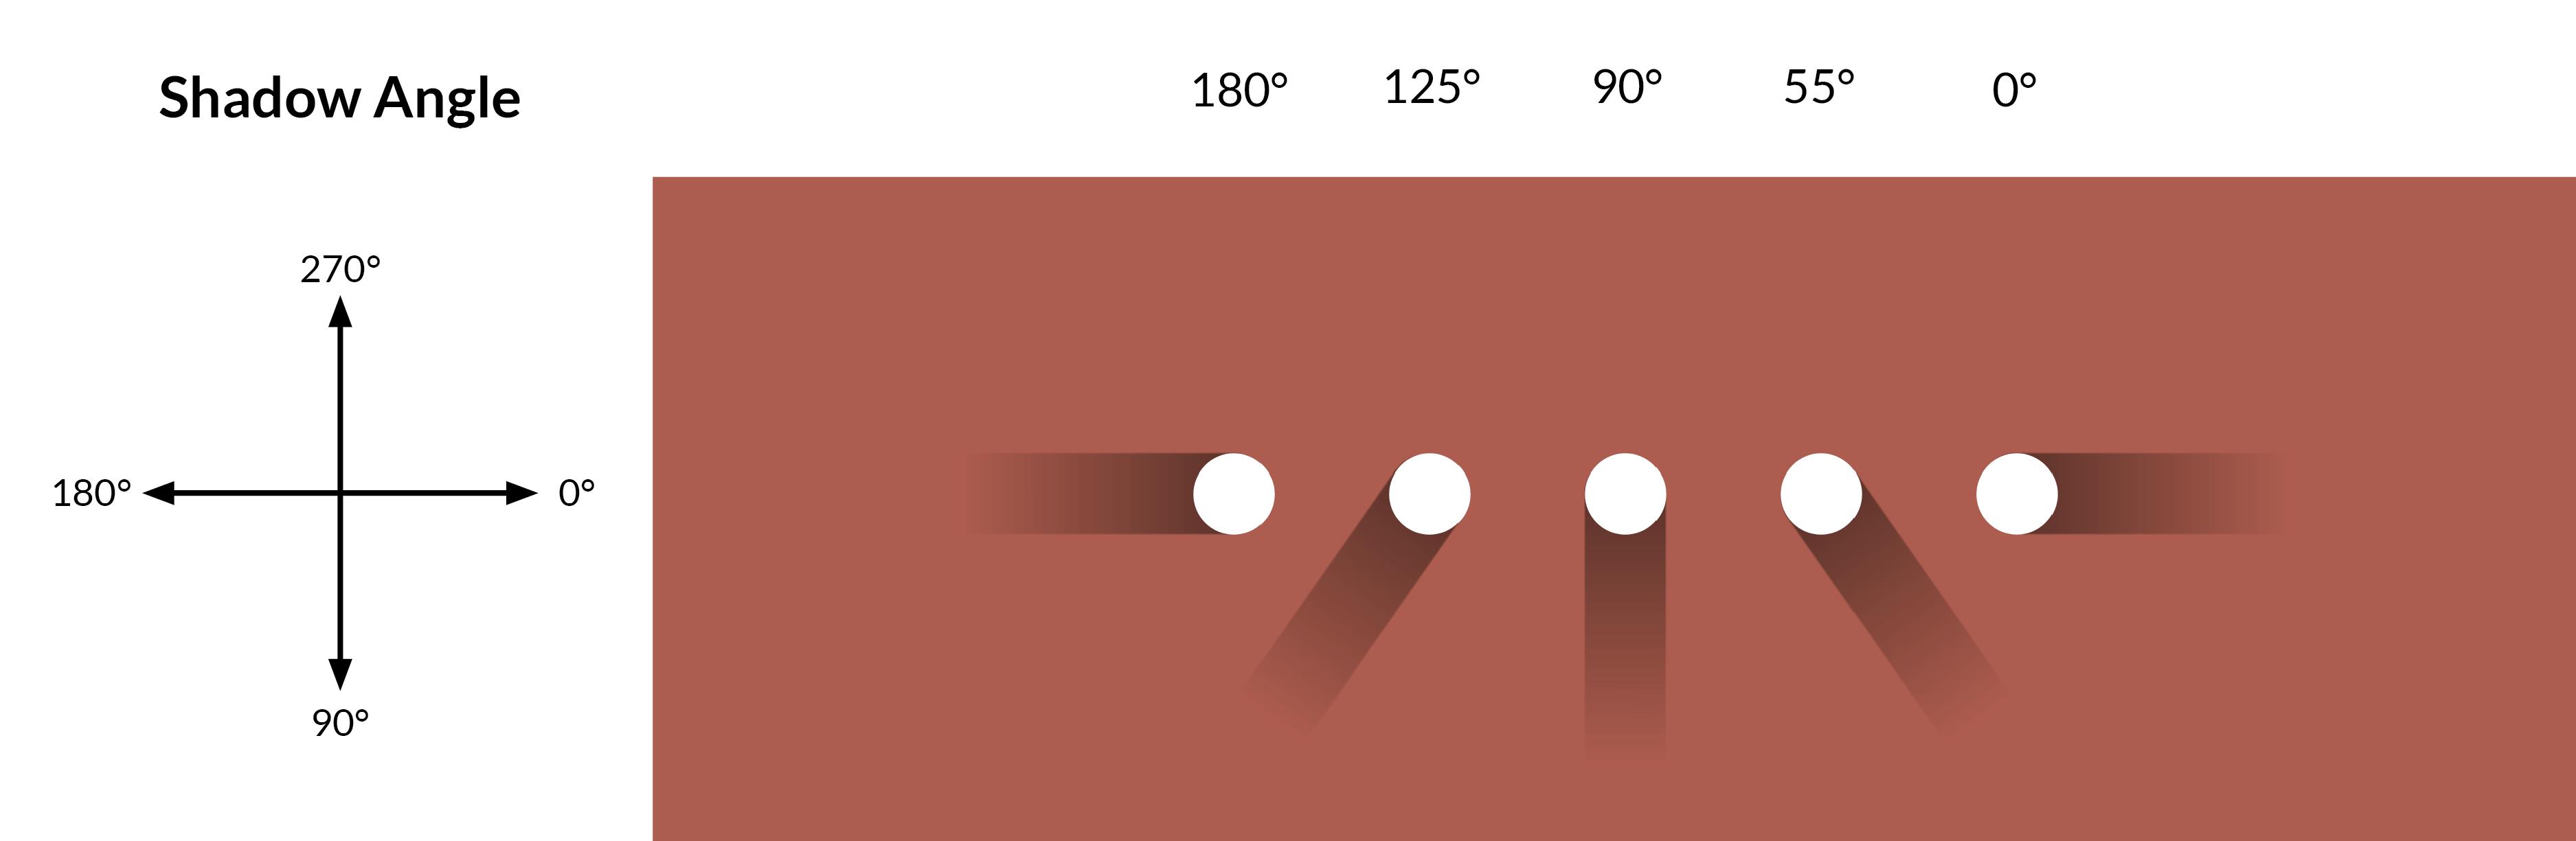 Long-Shadows Long Shadows for android! @codeKK AndroidOpen